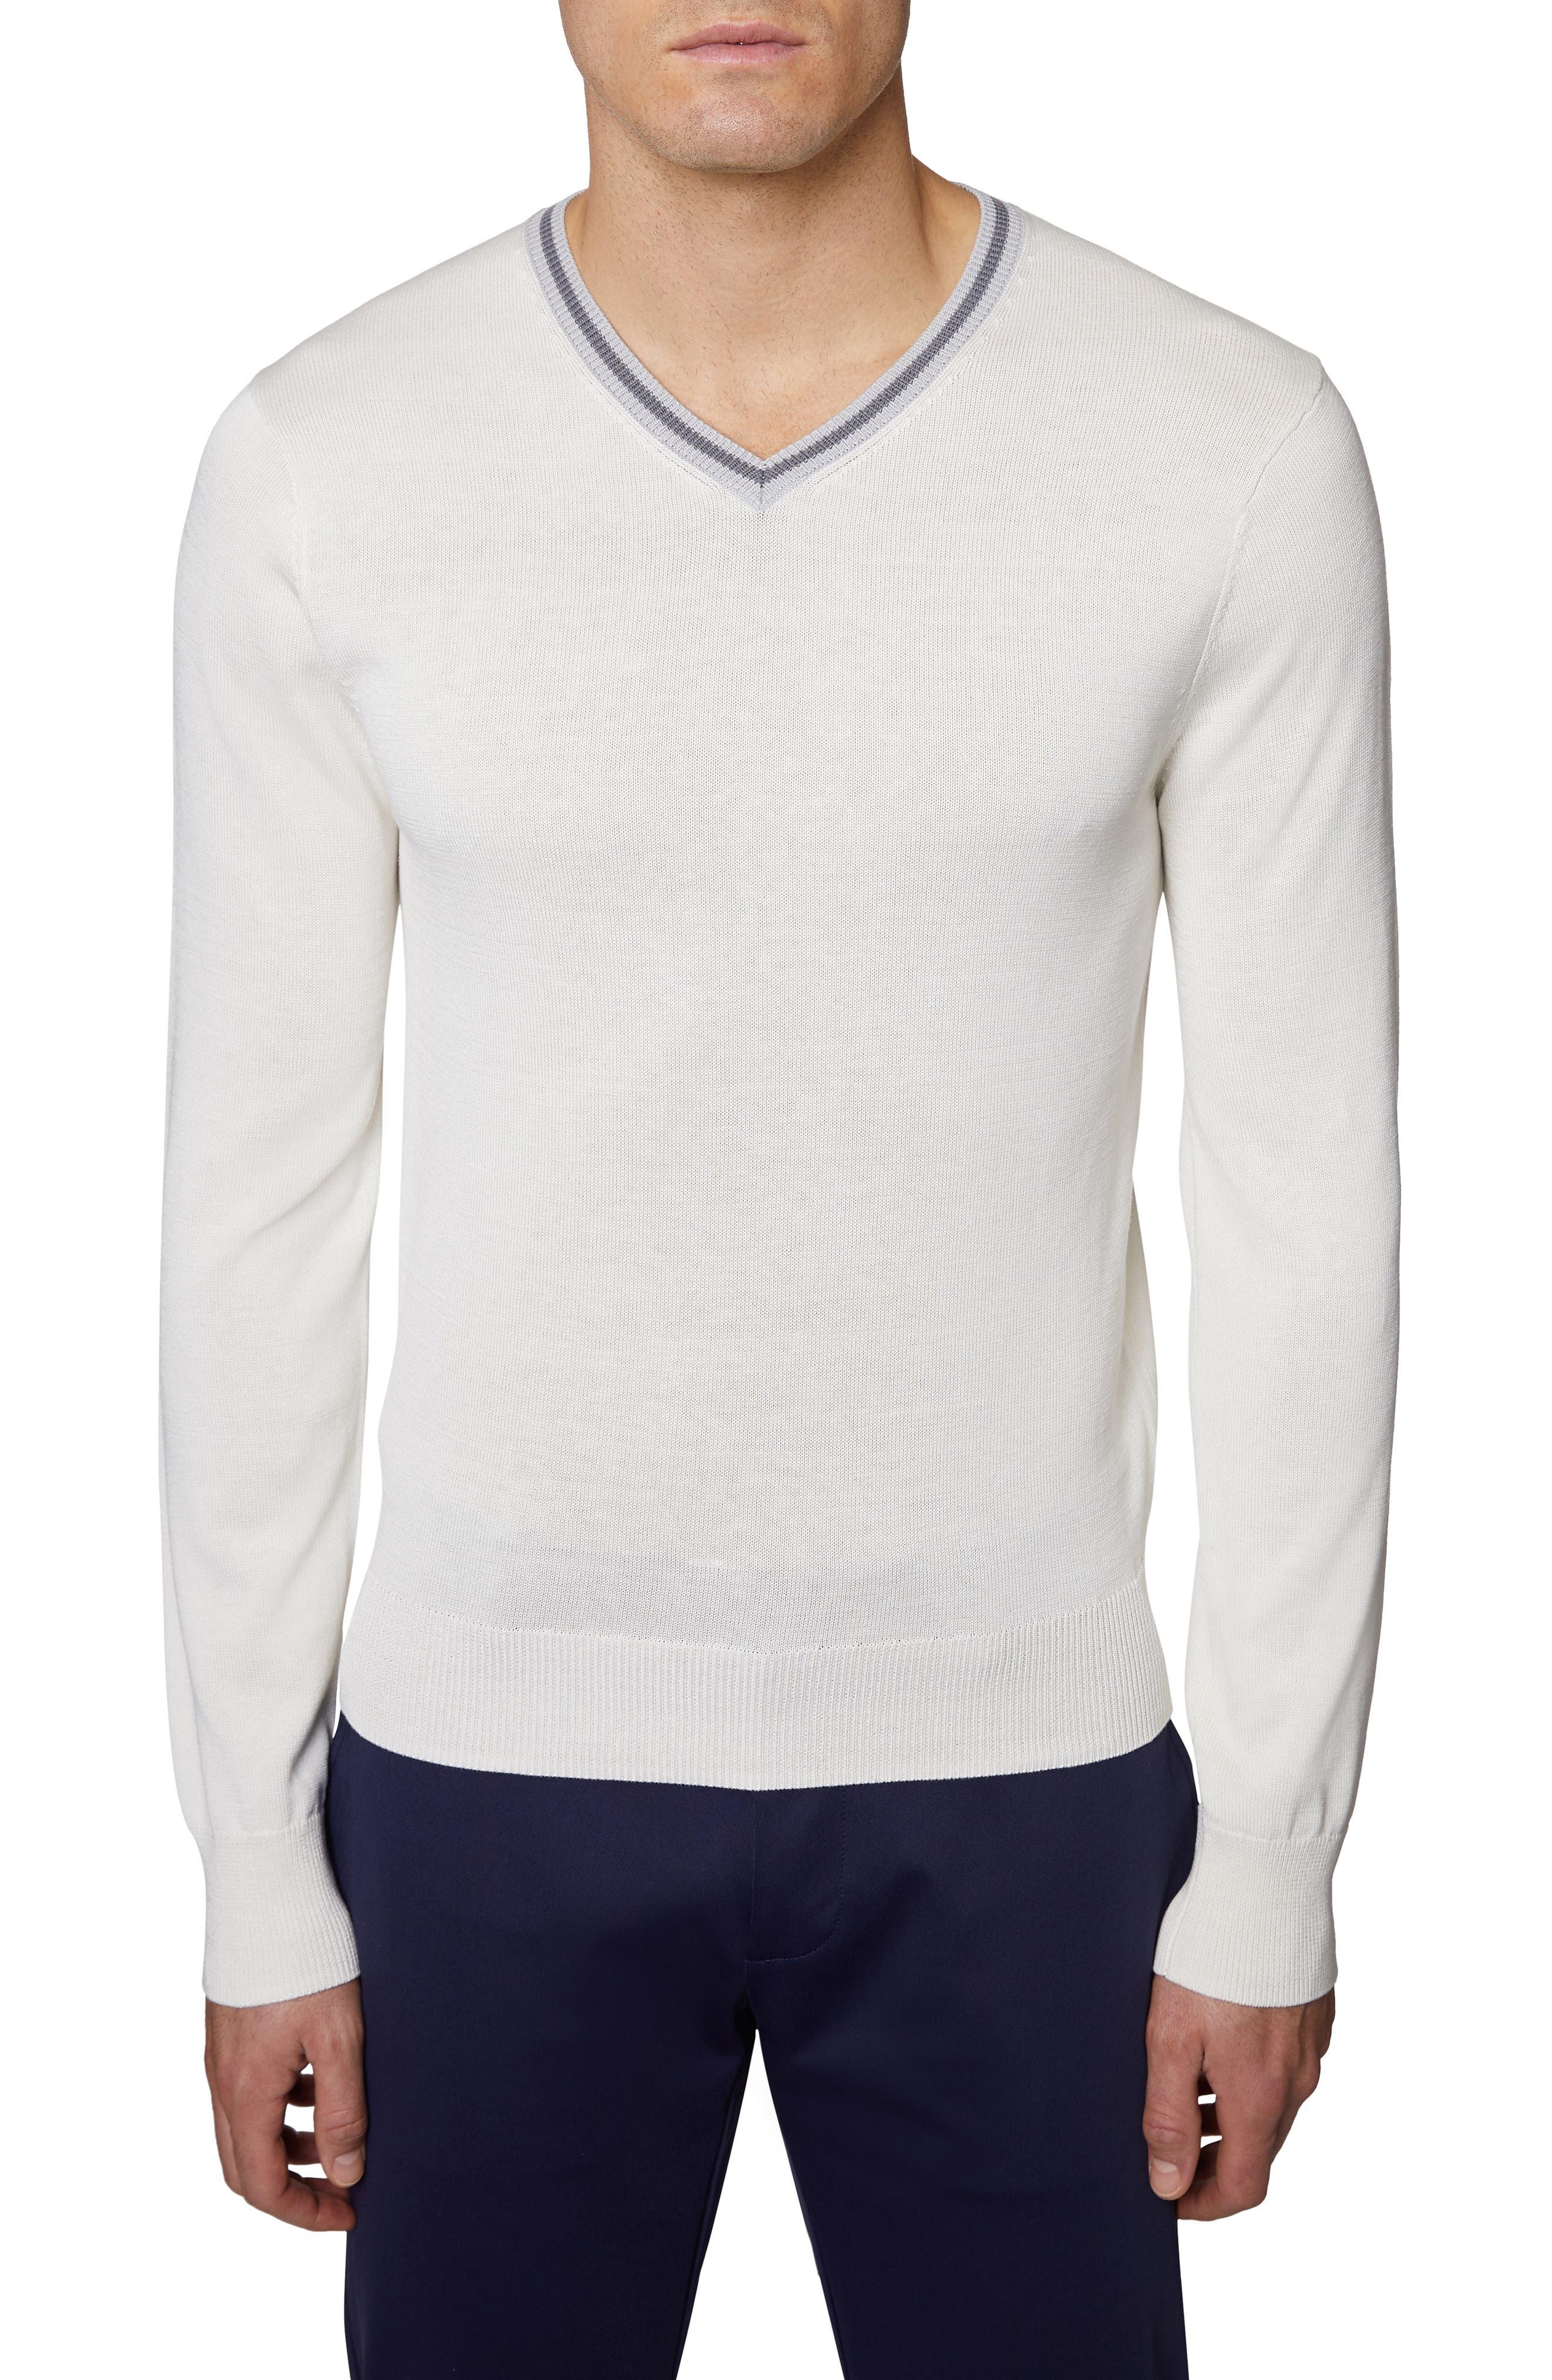 Hickey Freeman V-Neck Silk & Cotton Sweater, White